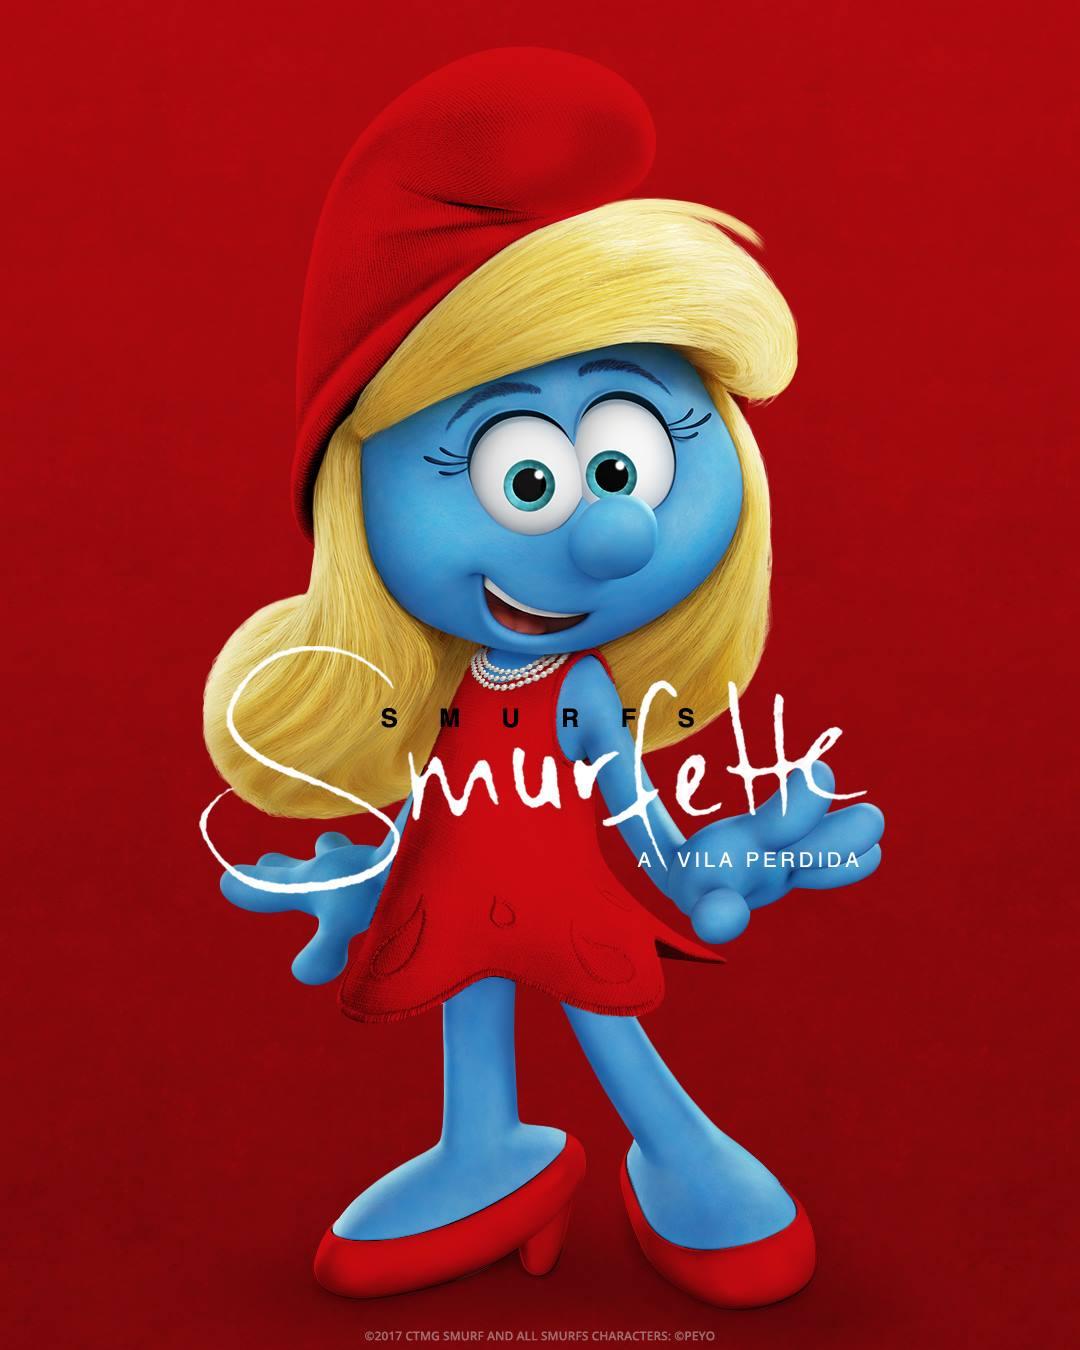 Smurfs_Oscar_08